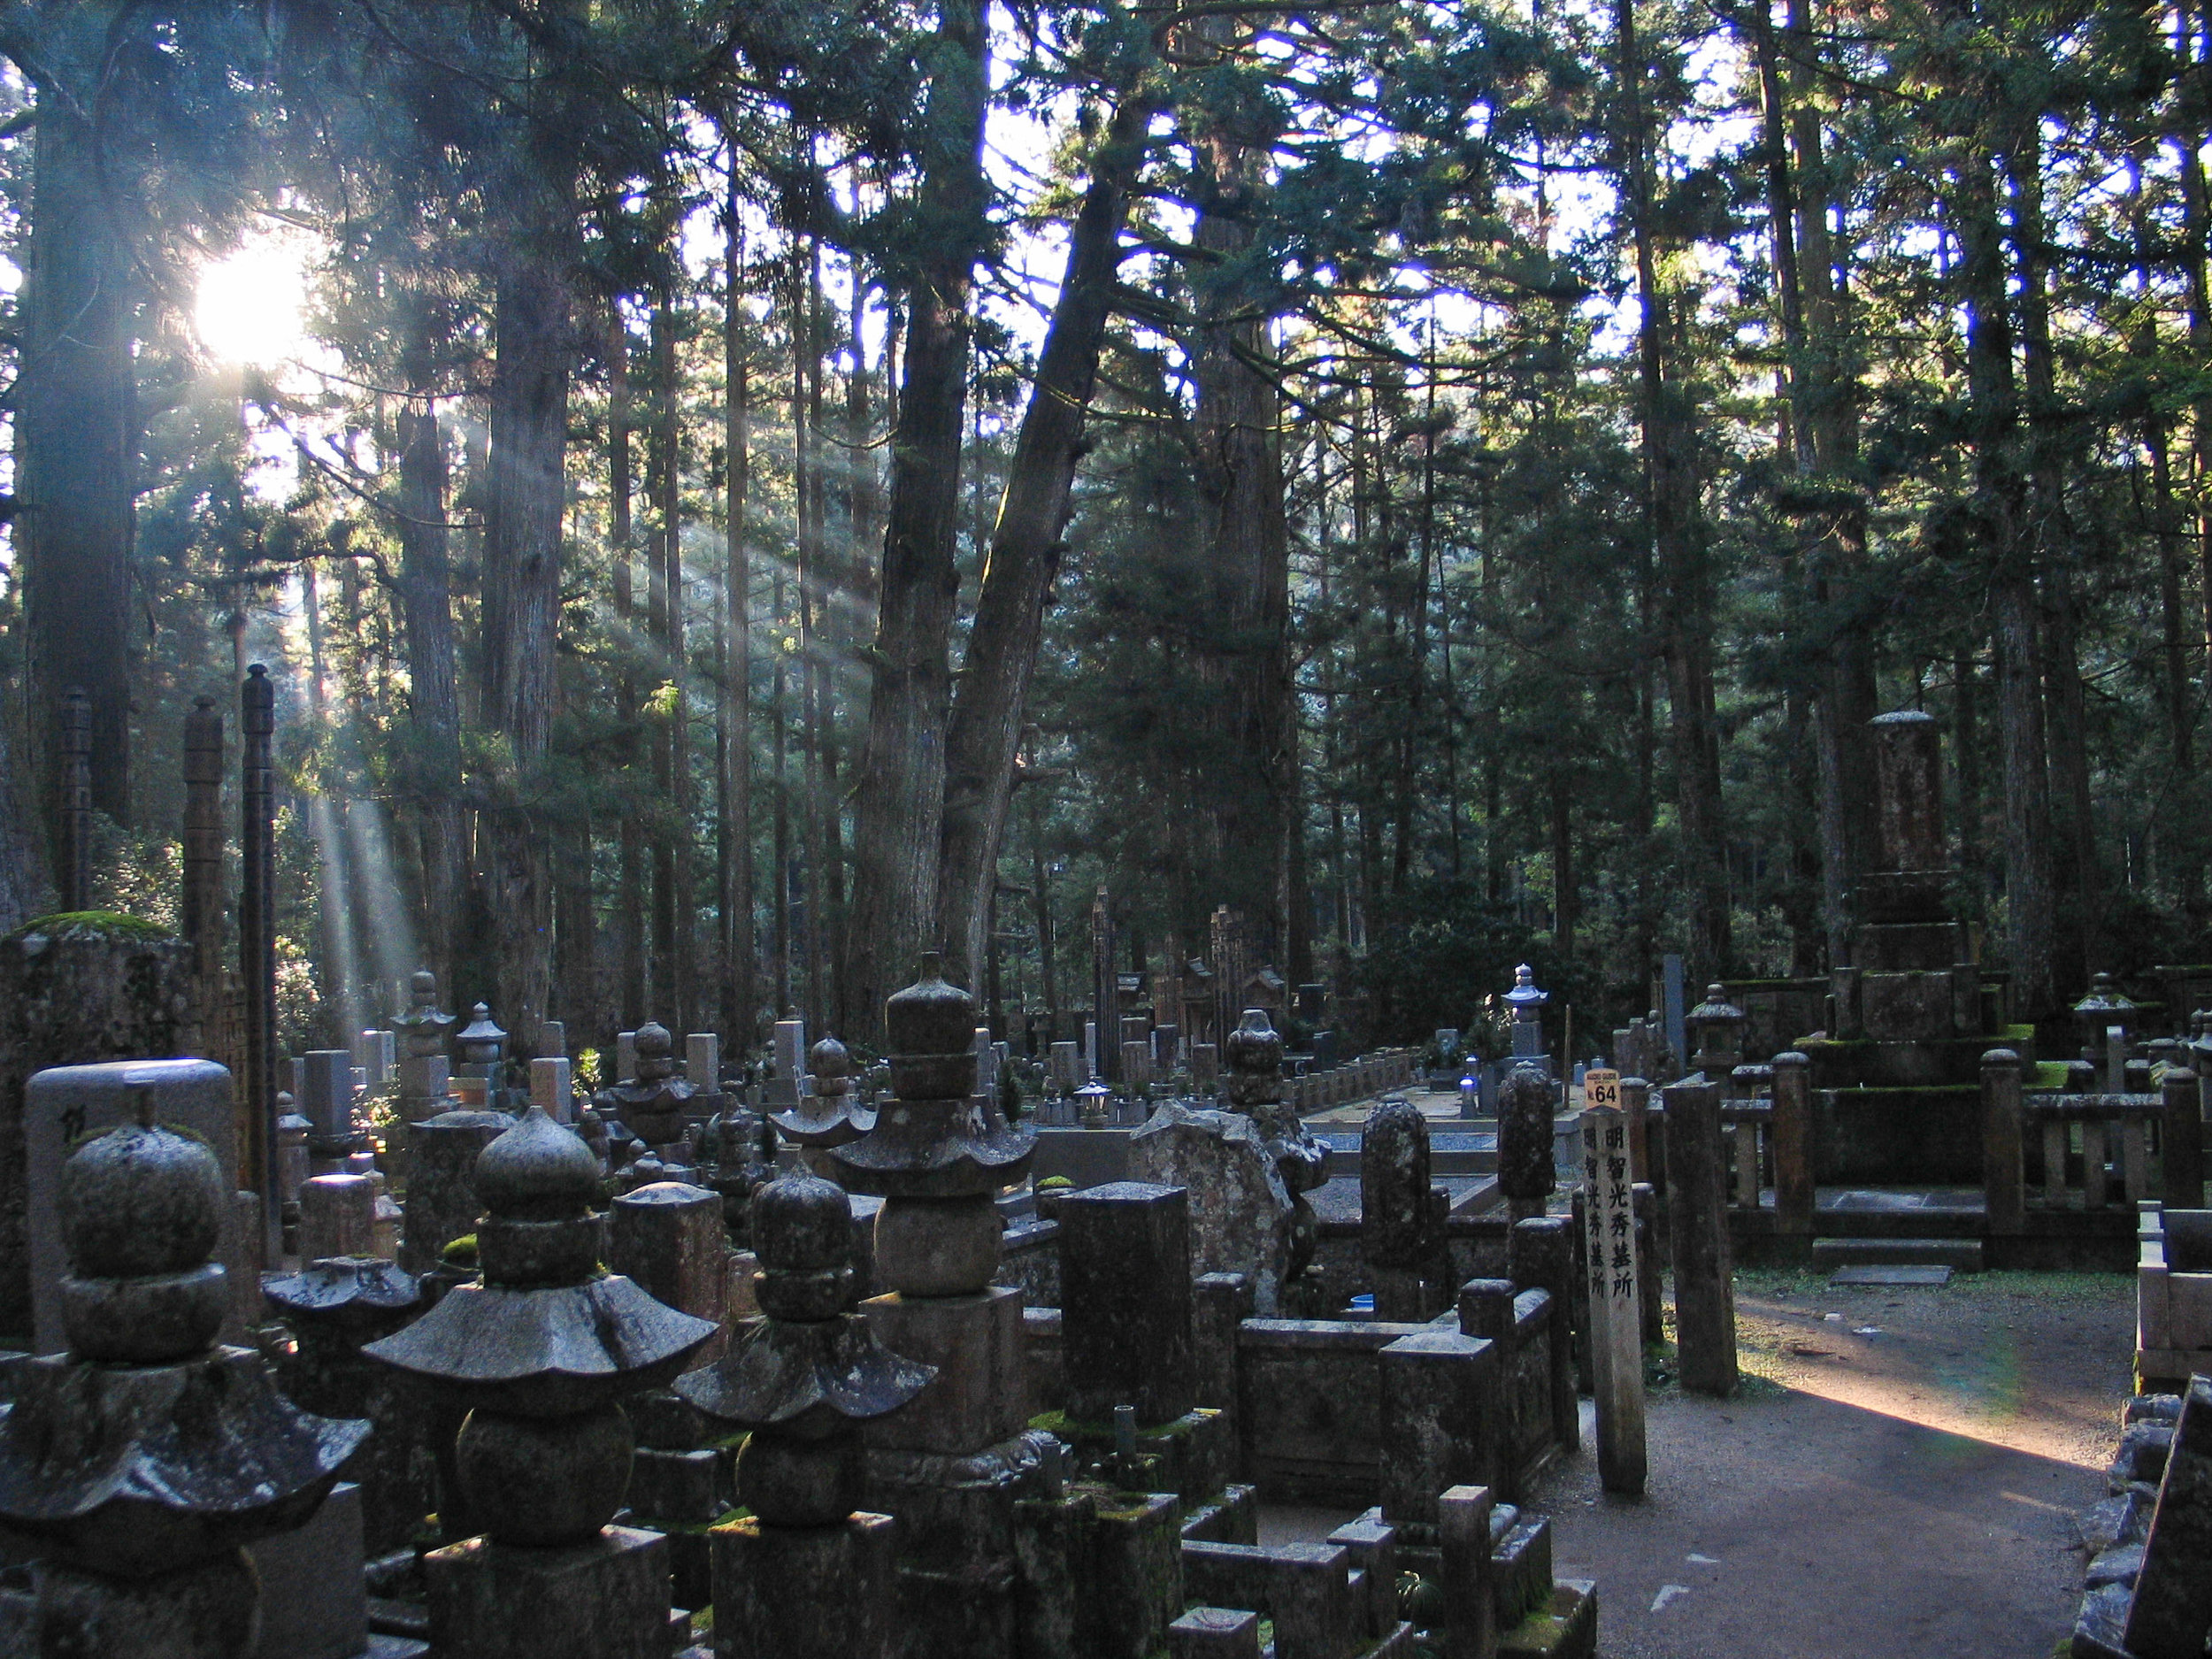 Mount Koya, Japan (9 images)